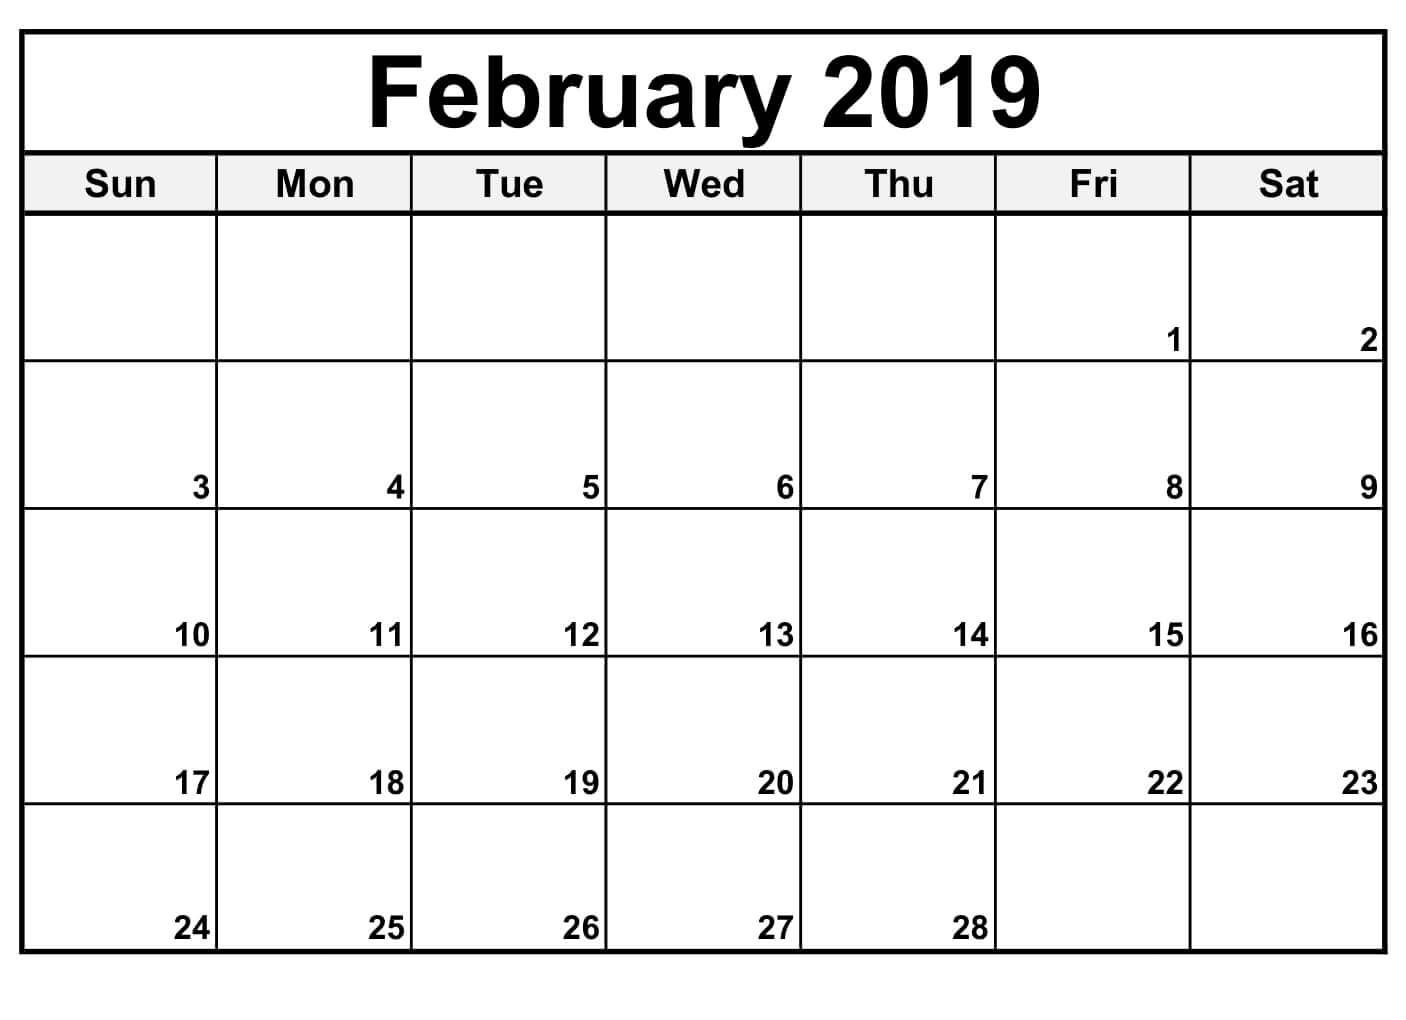 February 2019 Editable Calendar to Print